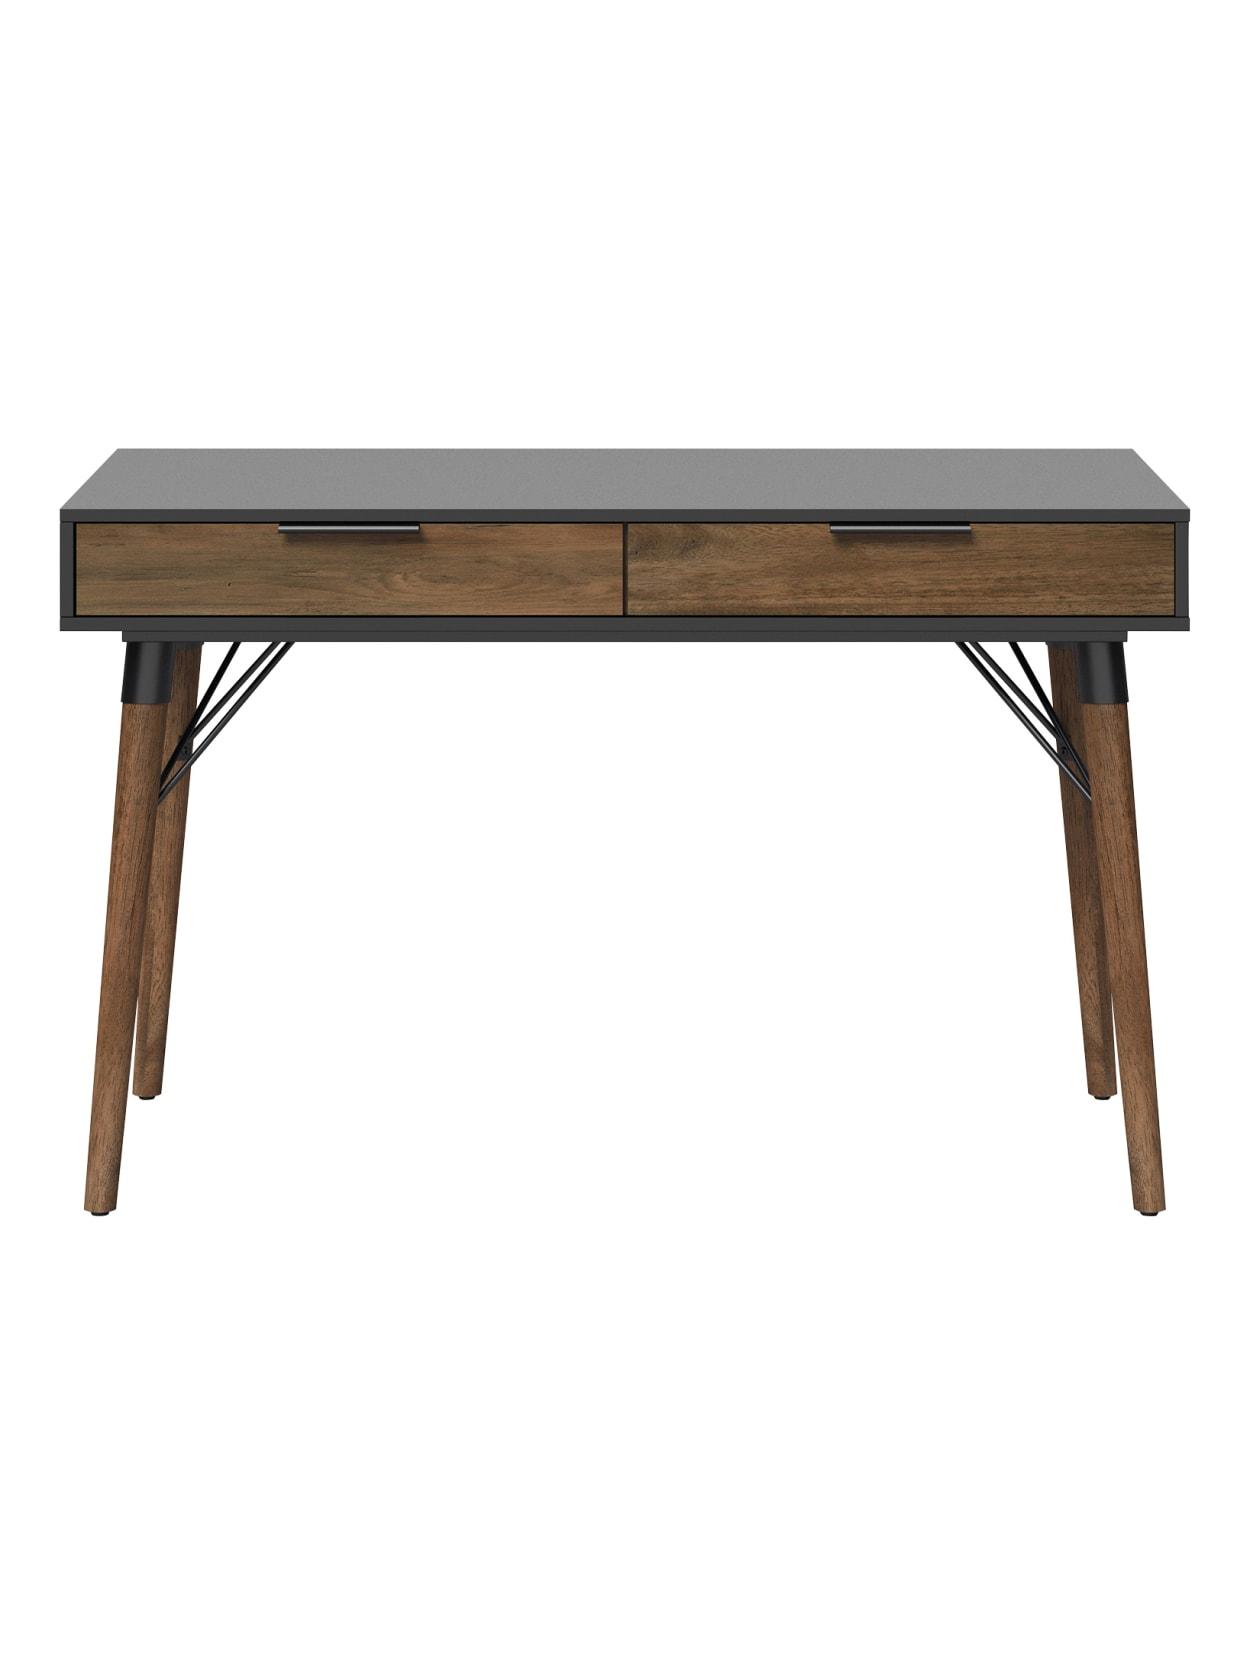 Elle D cor Dani 31 W Writing Desk Old World Rustic PineDusk Gray